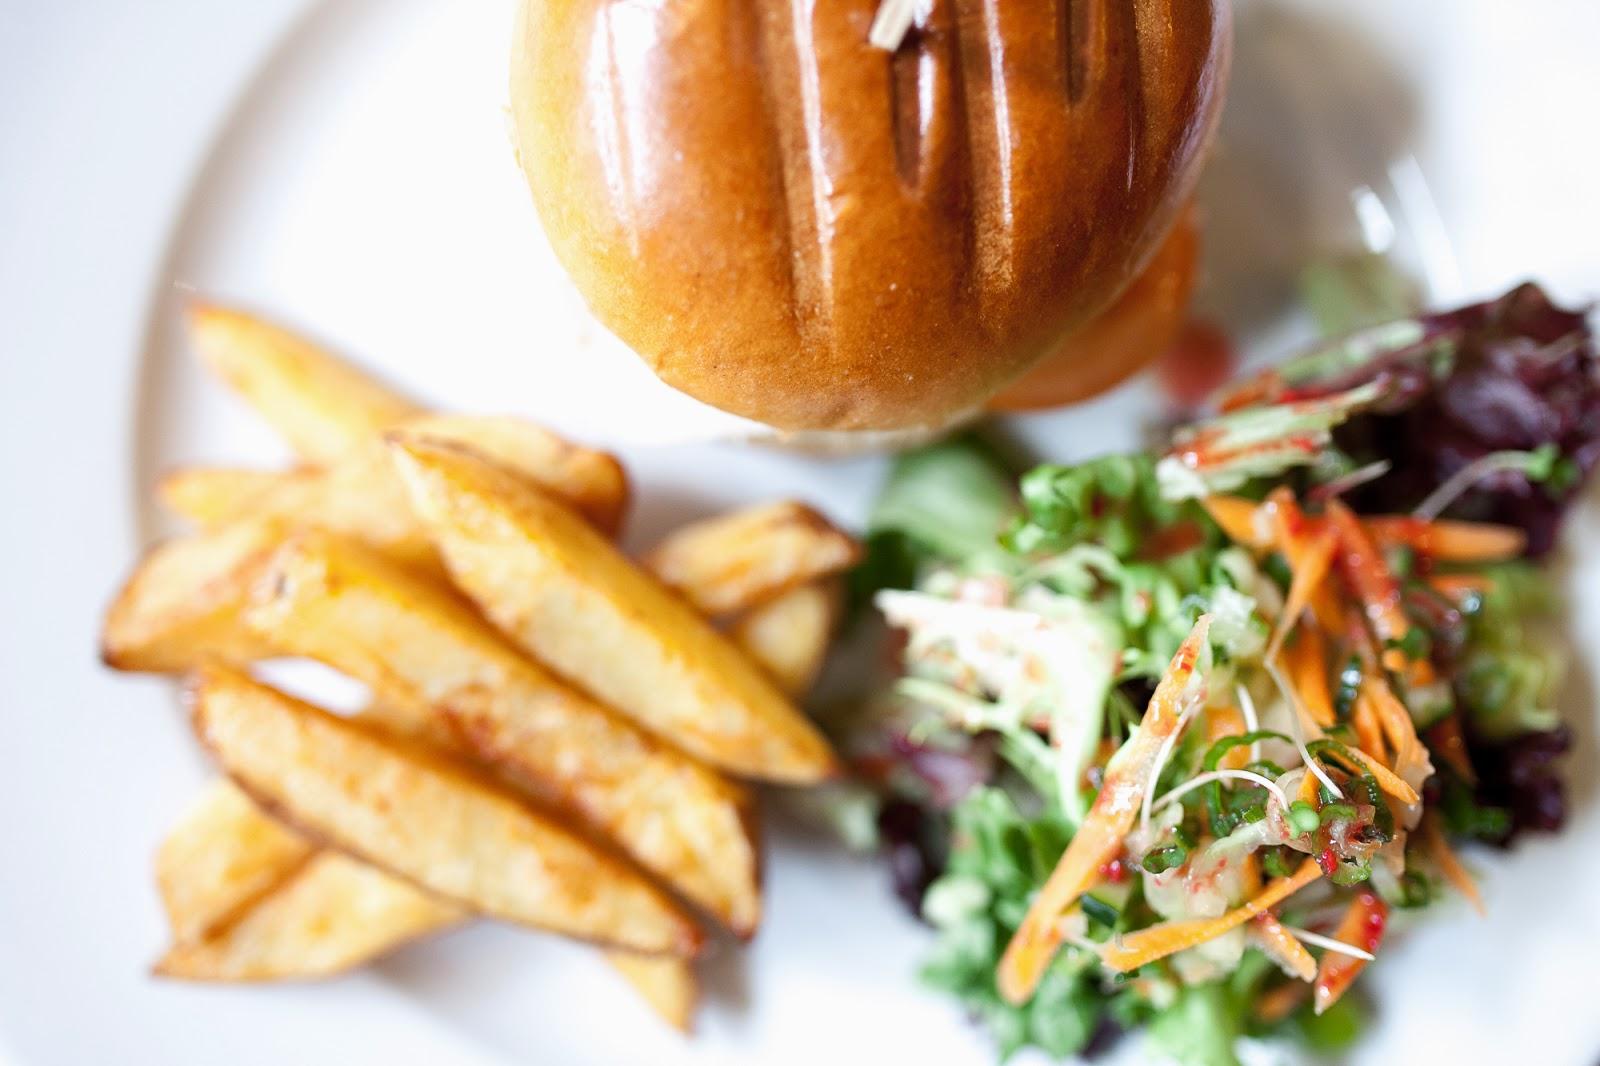 Burger chips and salad